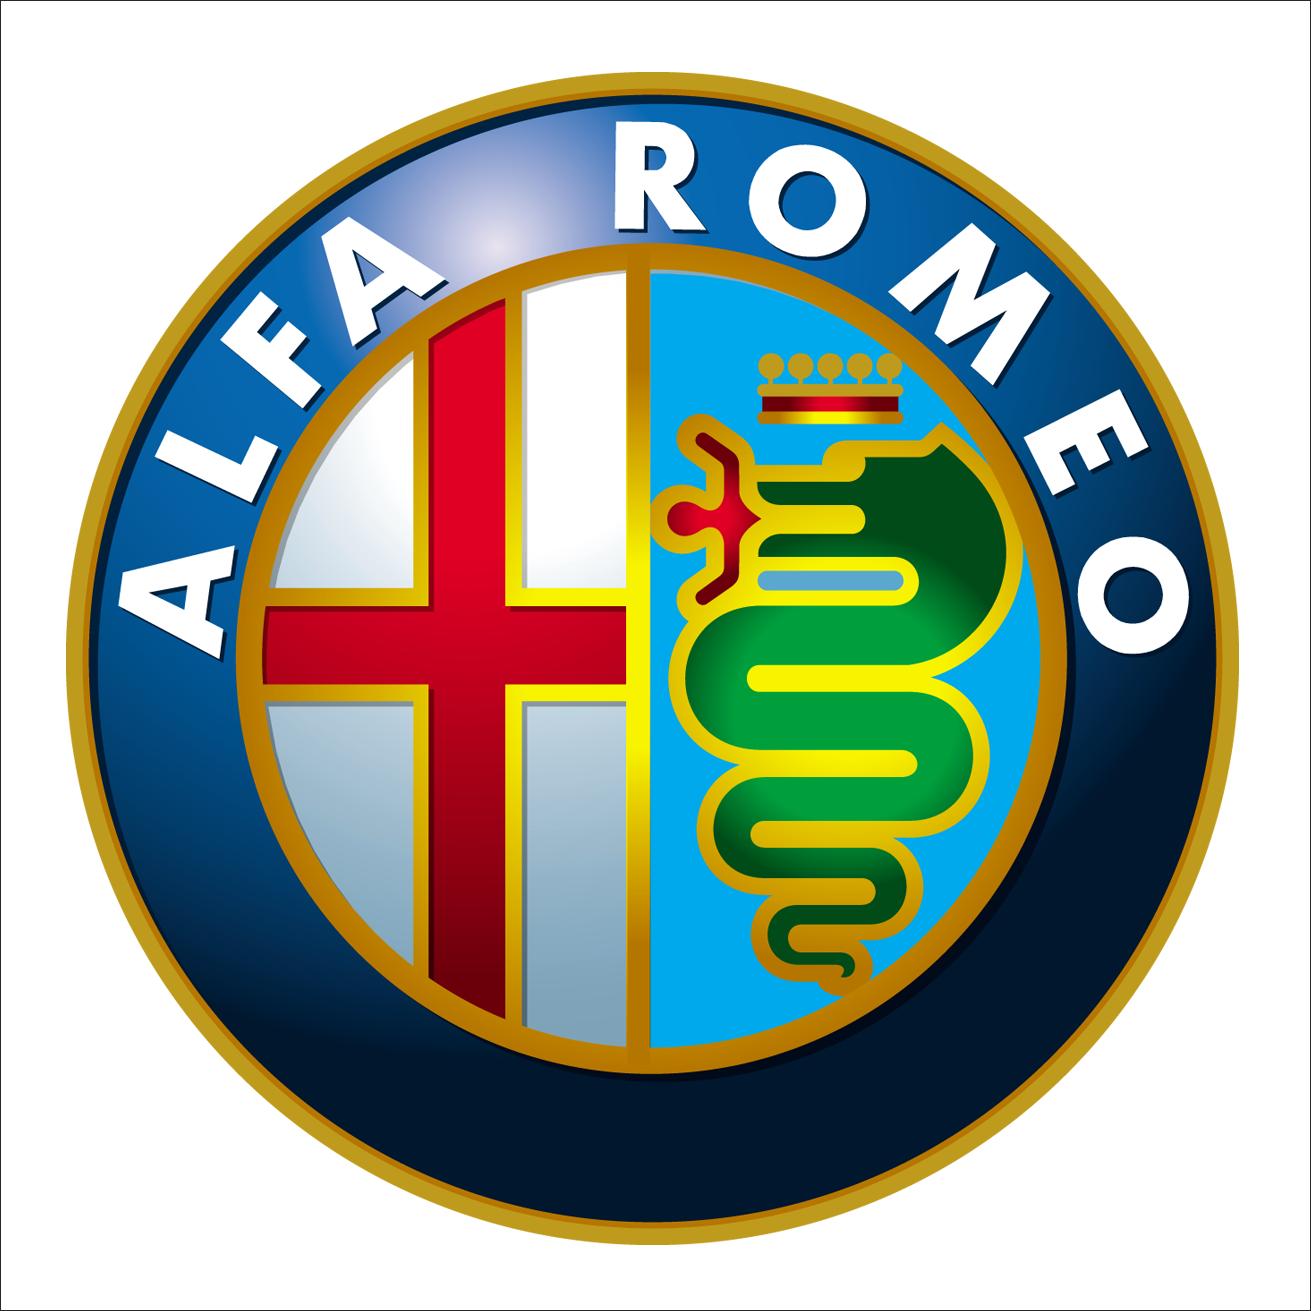 Maybach Symbol >> Alfa Romeo Logo Meaning and History, latest models | World Cars Brands